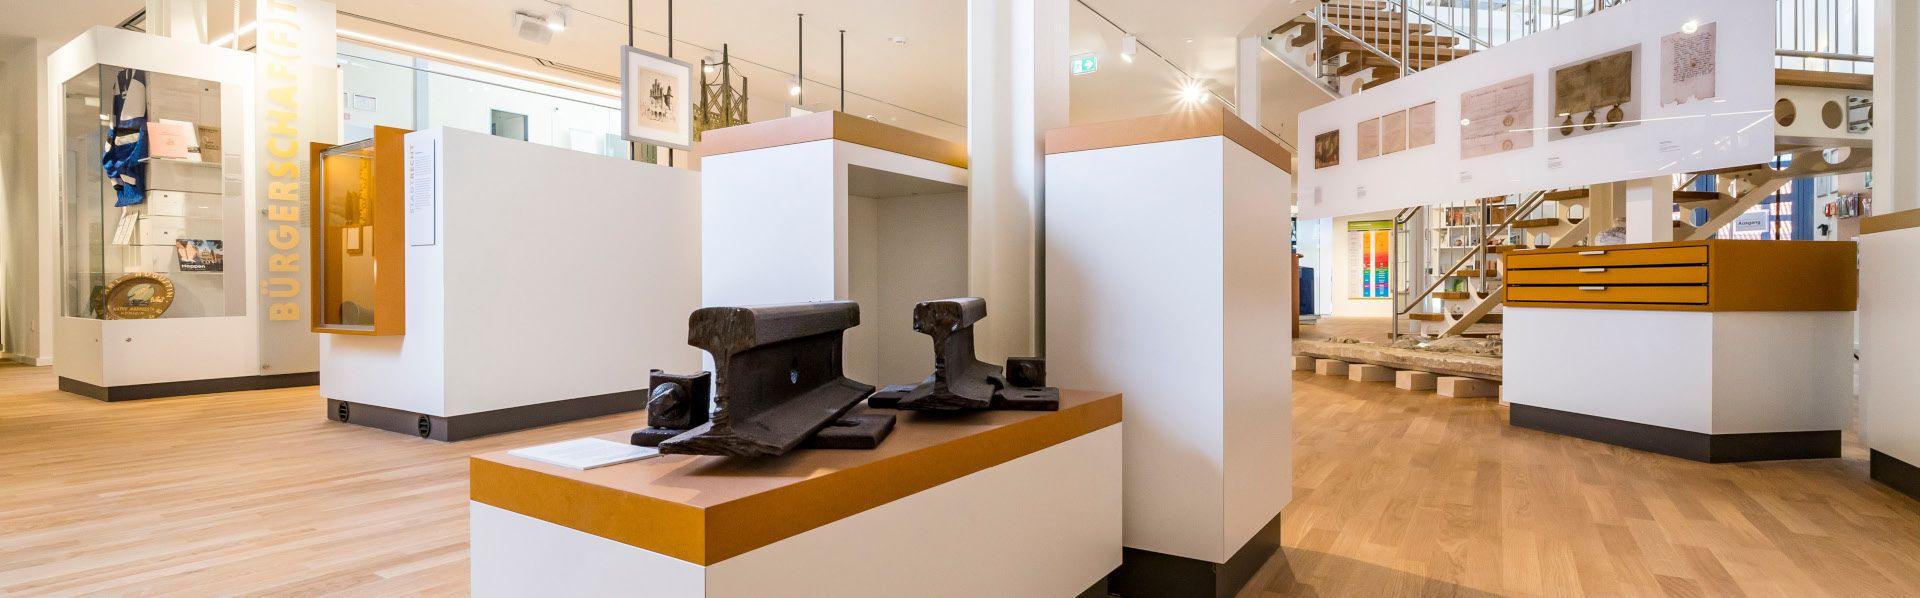 Stadtmuseum Unsere Angebote